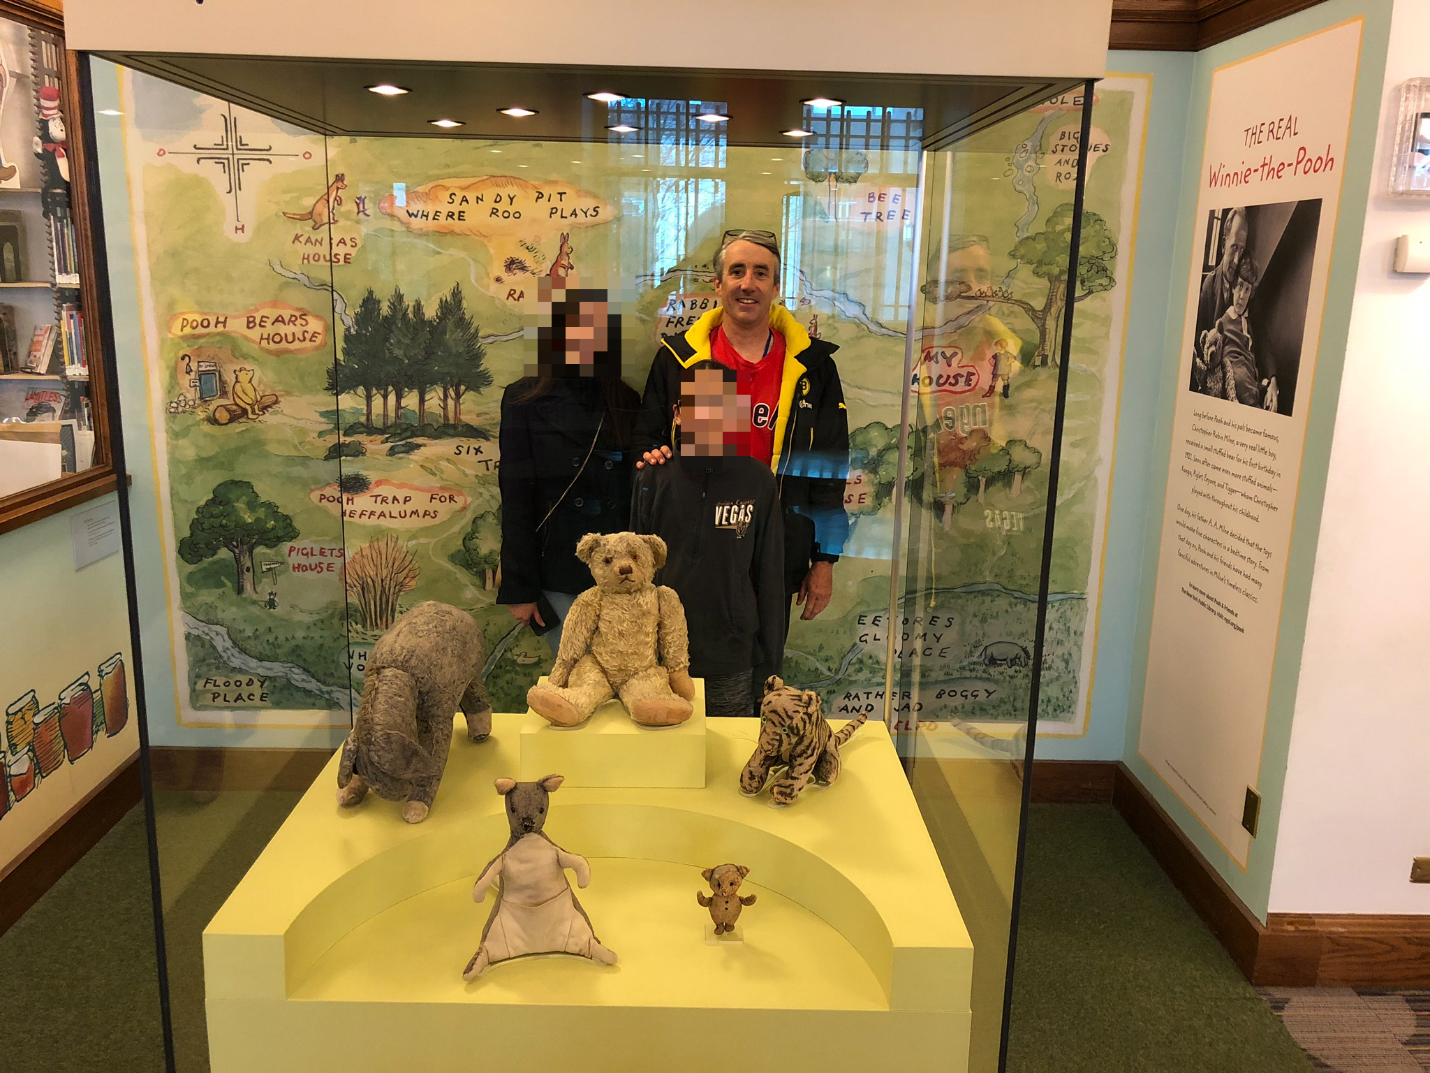 The original Winnie the Pooh toys